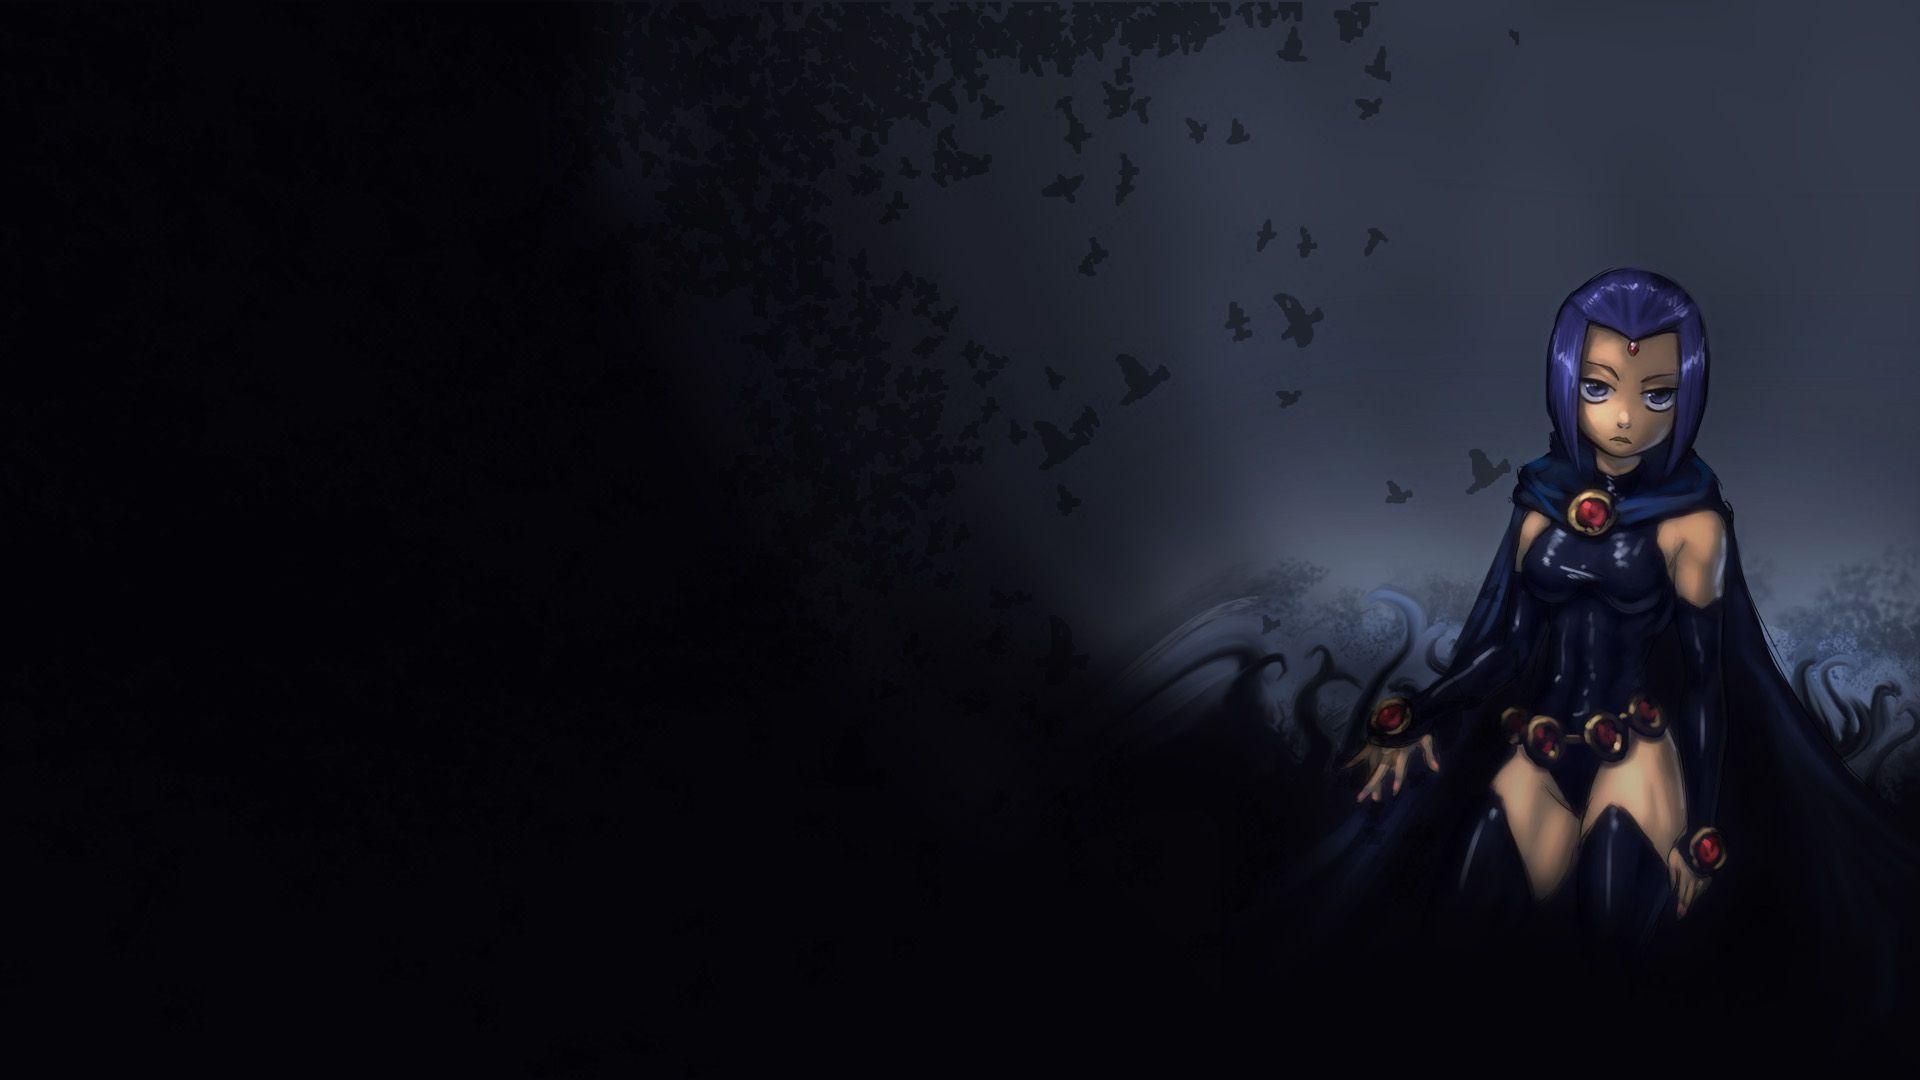 raven wallpaper / birds hd backgrounds 1920×1080 Raven